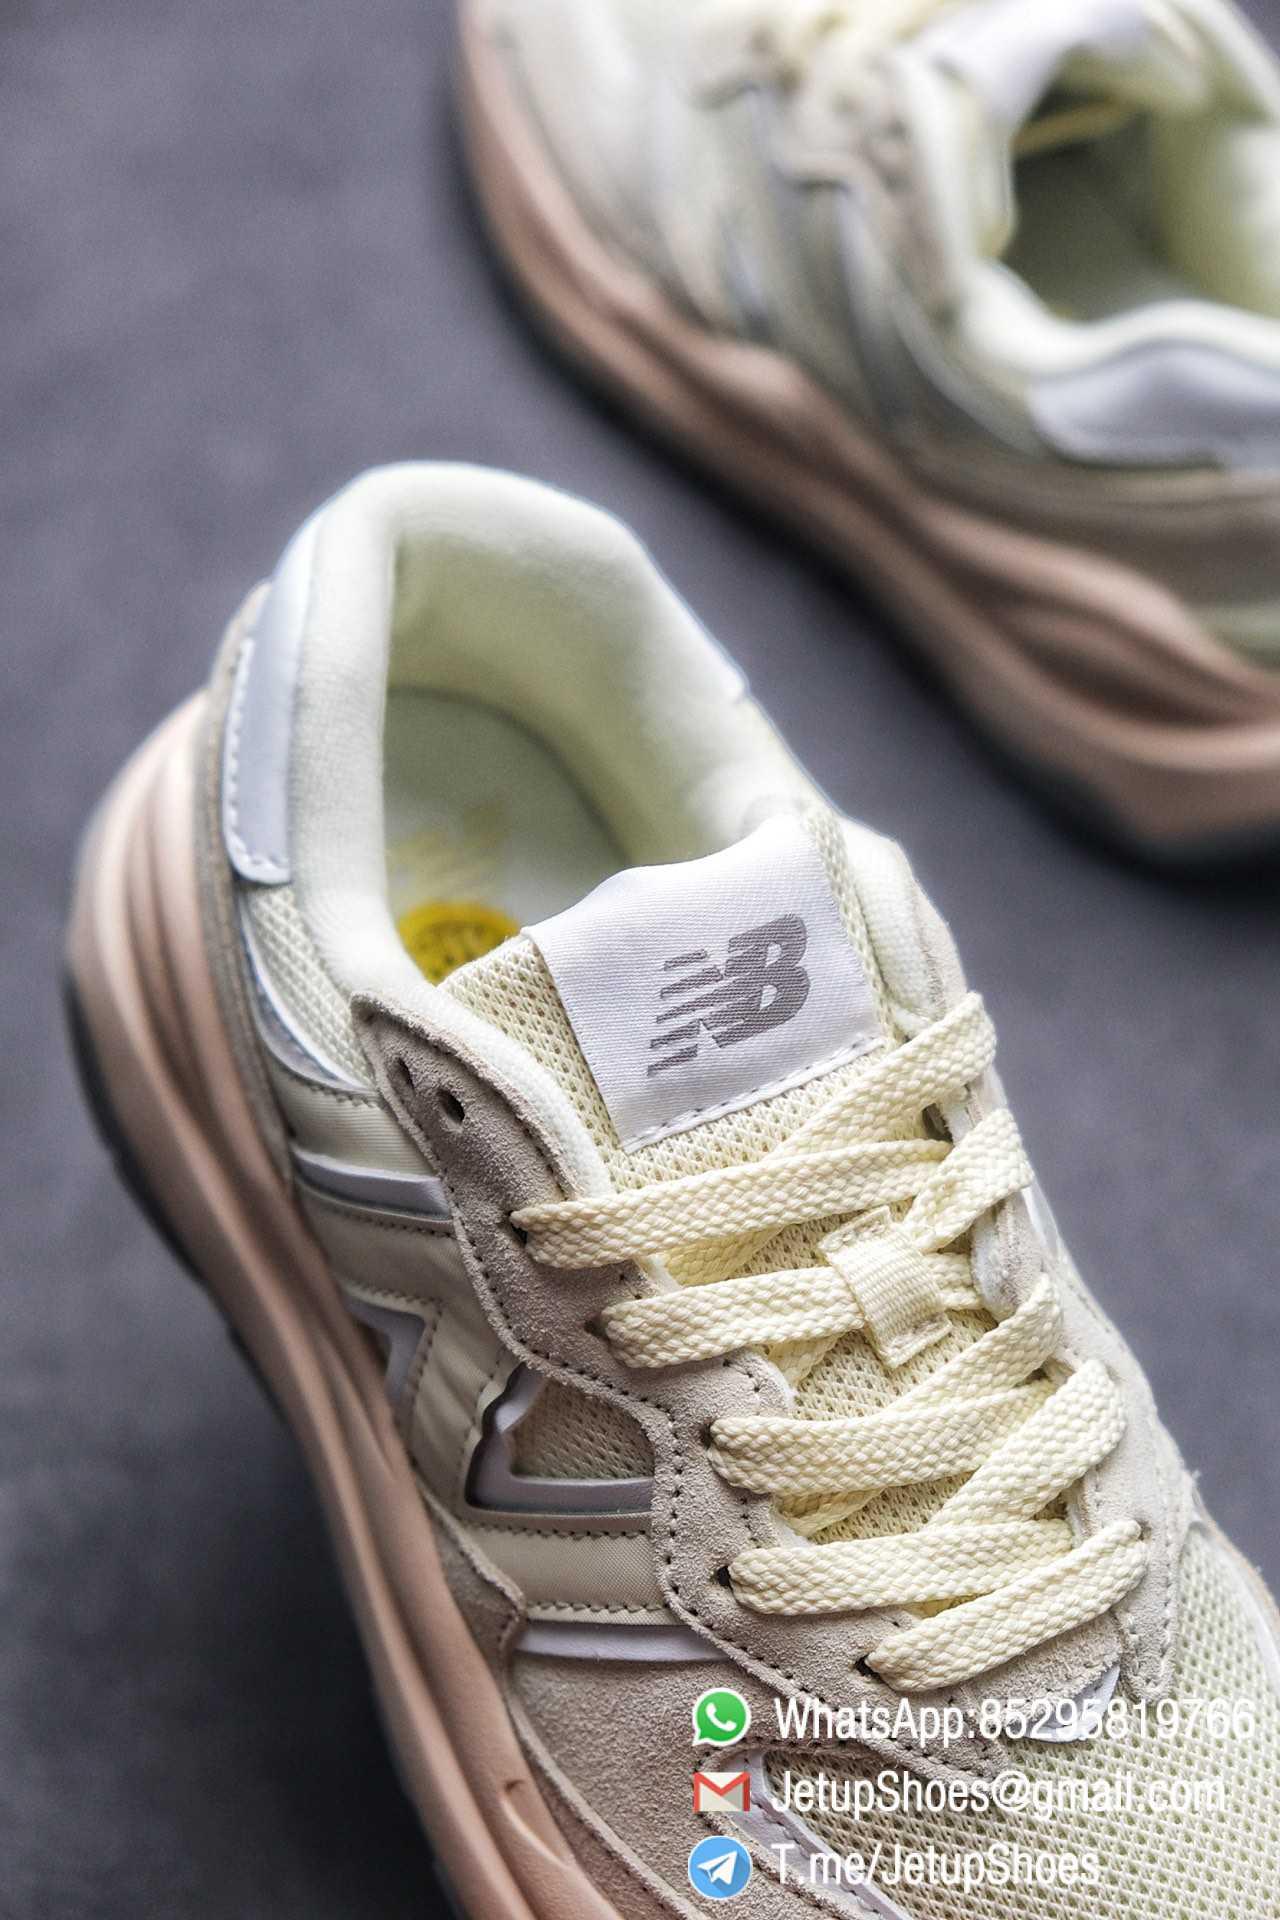 Best Replica New Balance 5740 Beige Cream SKU W5740CE Mesh Shell Suede Upper Big N Logo Pink Boot Top Quality Supplier 07